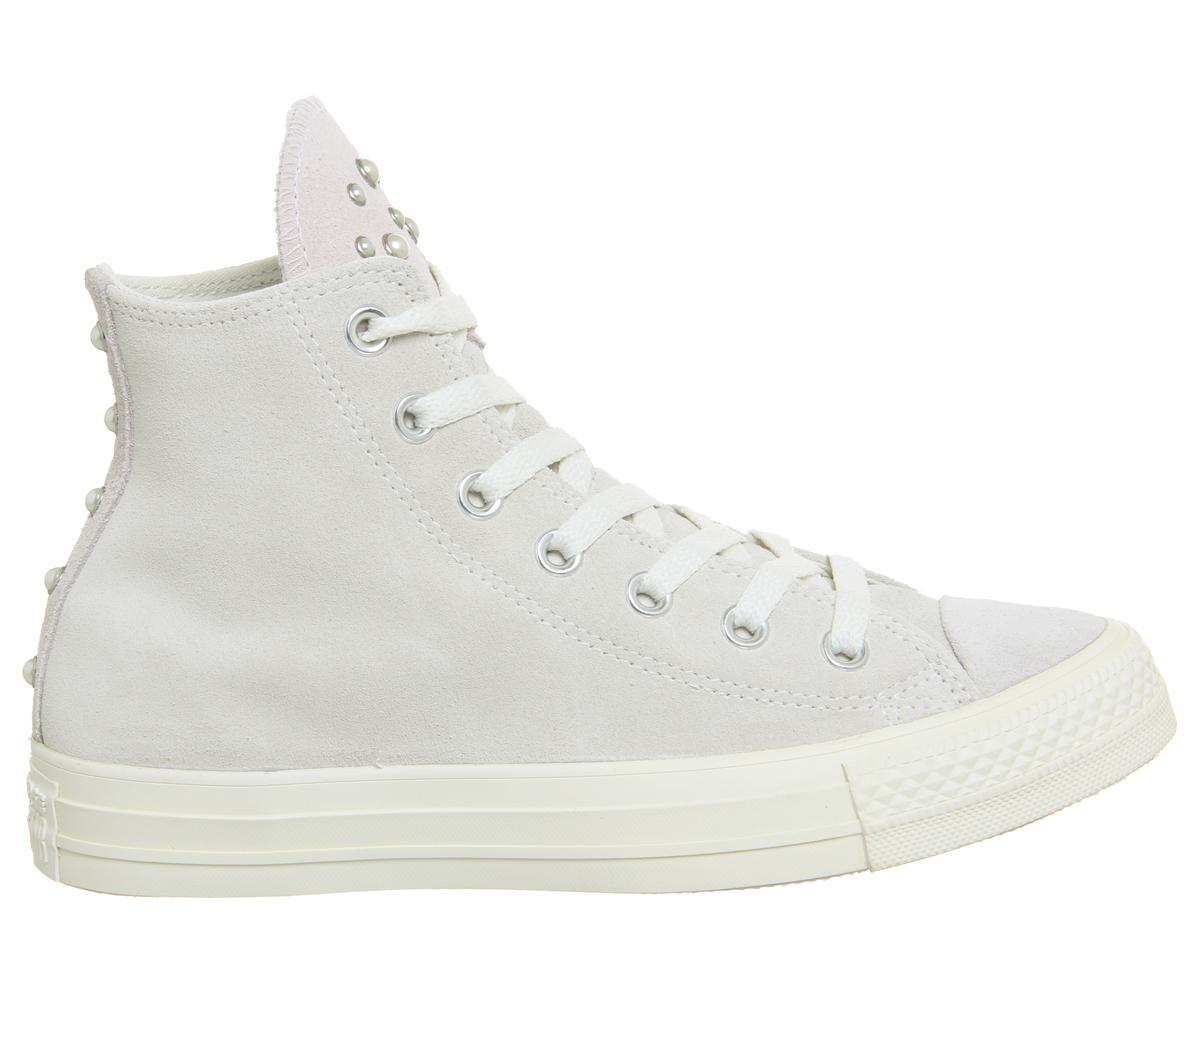 Converse All Star Hi Leather Egret Pale Quartz Blush Pearl